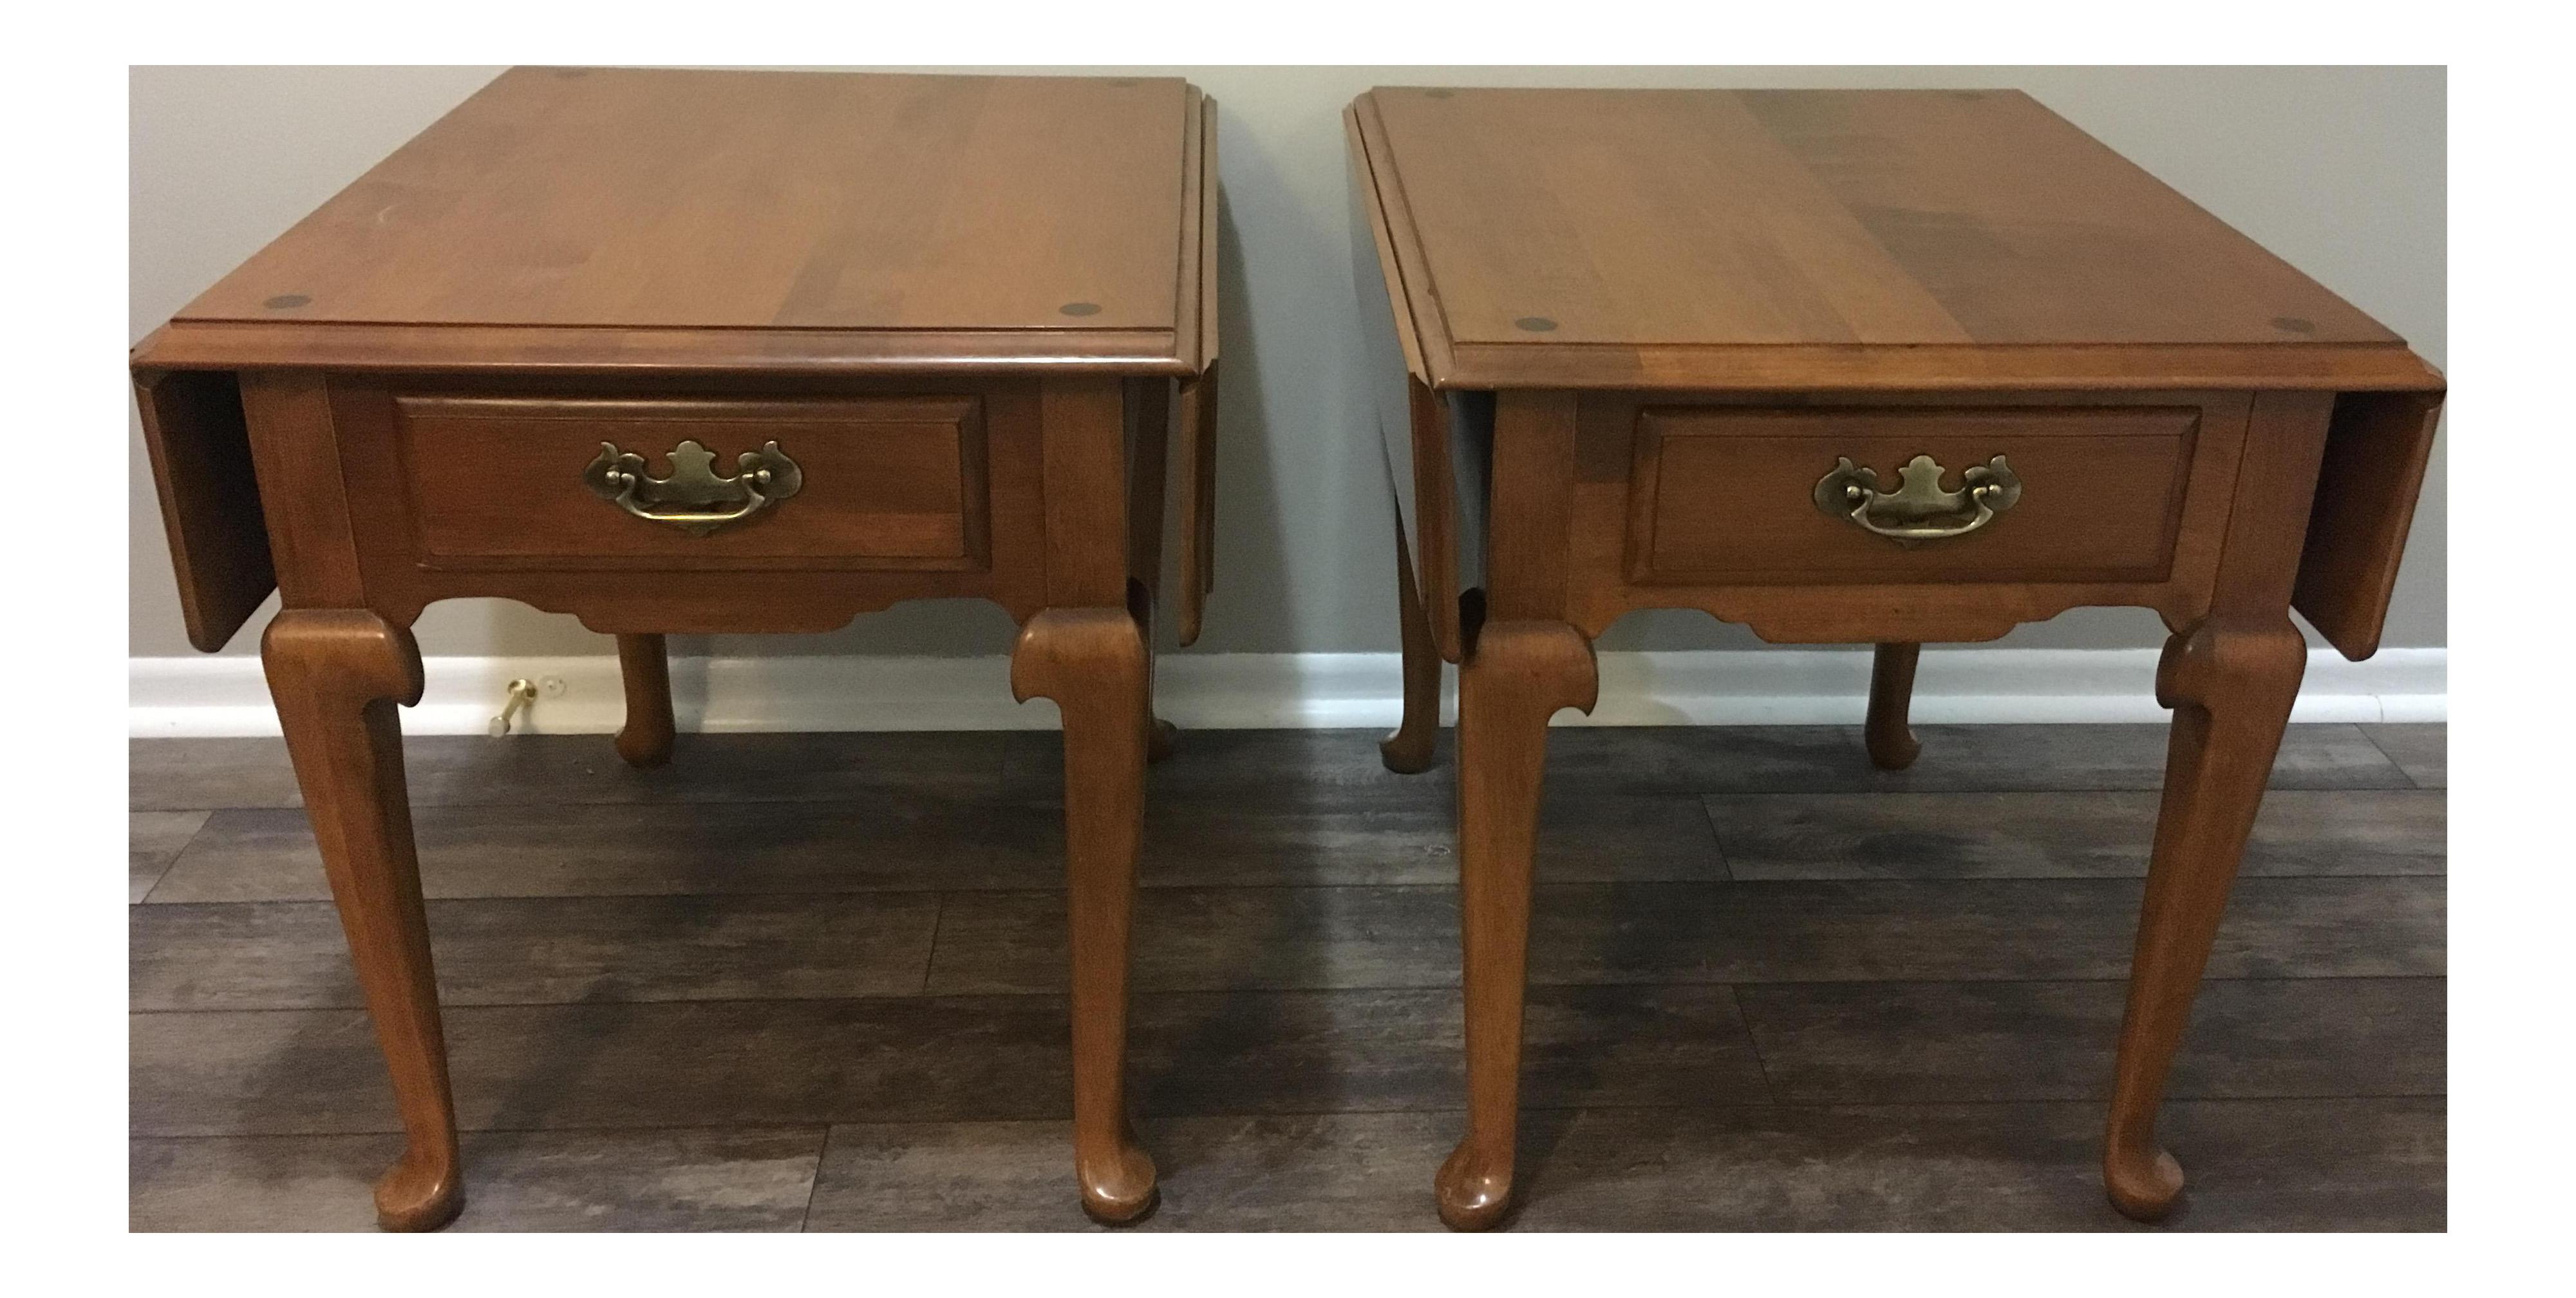 Vintage Ethan Allen Drop Leaf Side Tables A Pair On Chairish Com